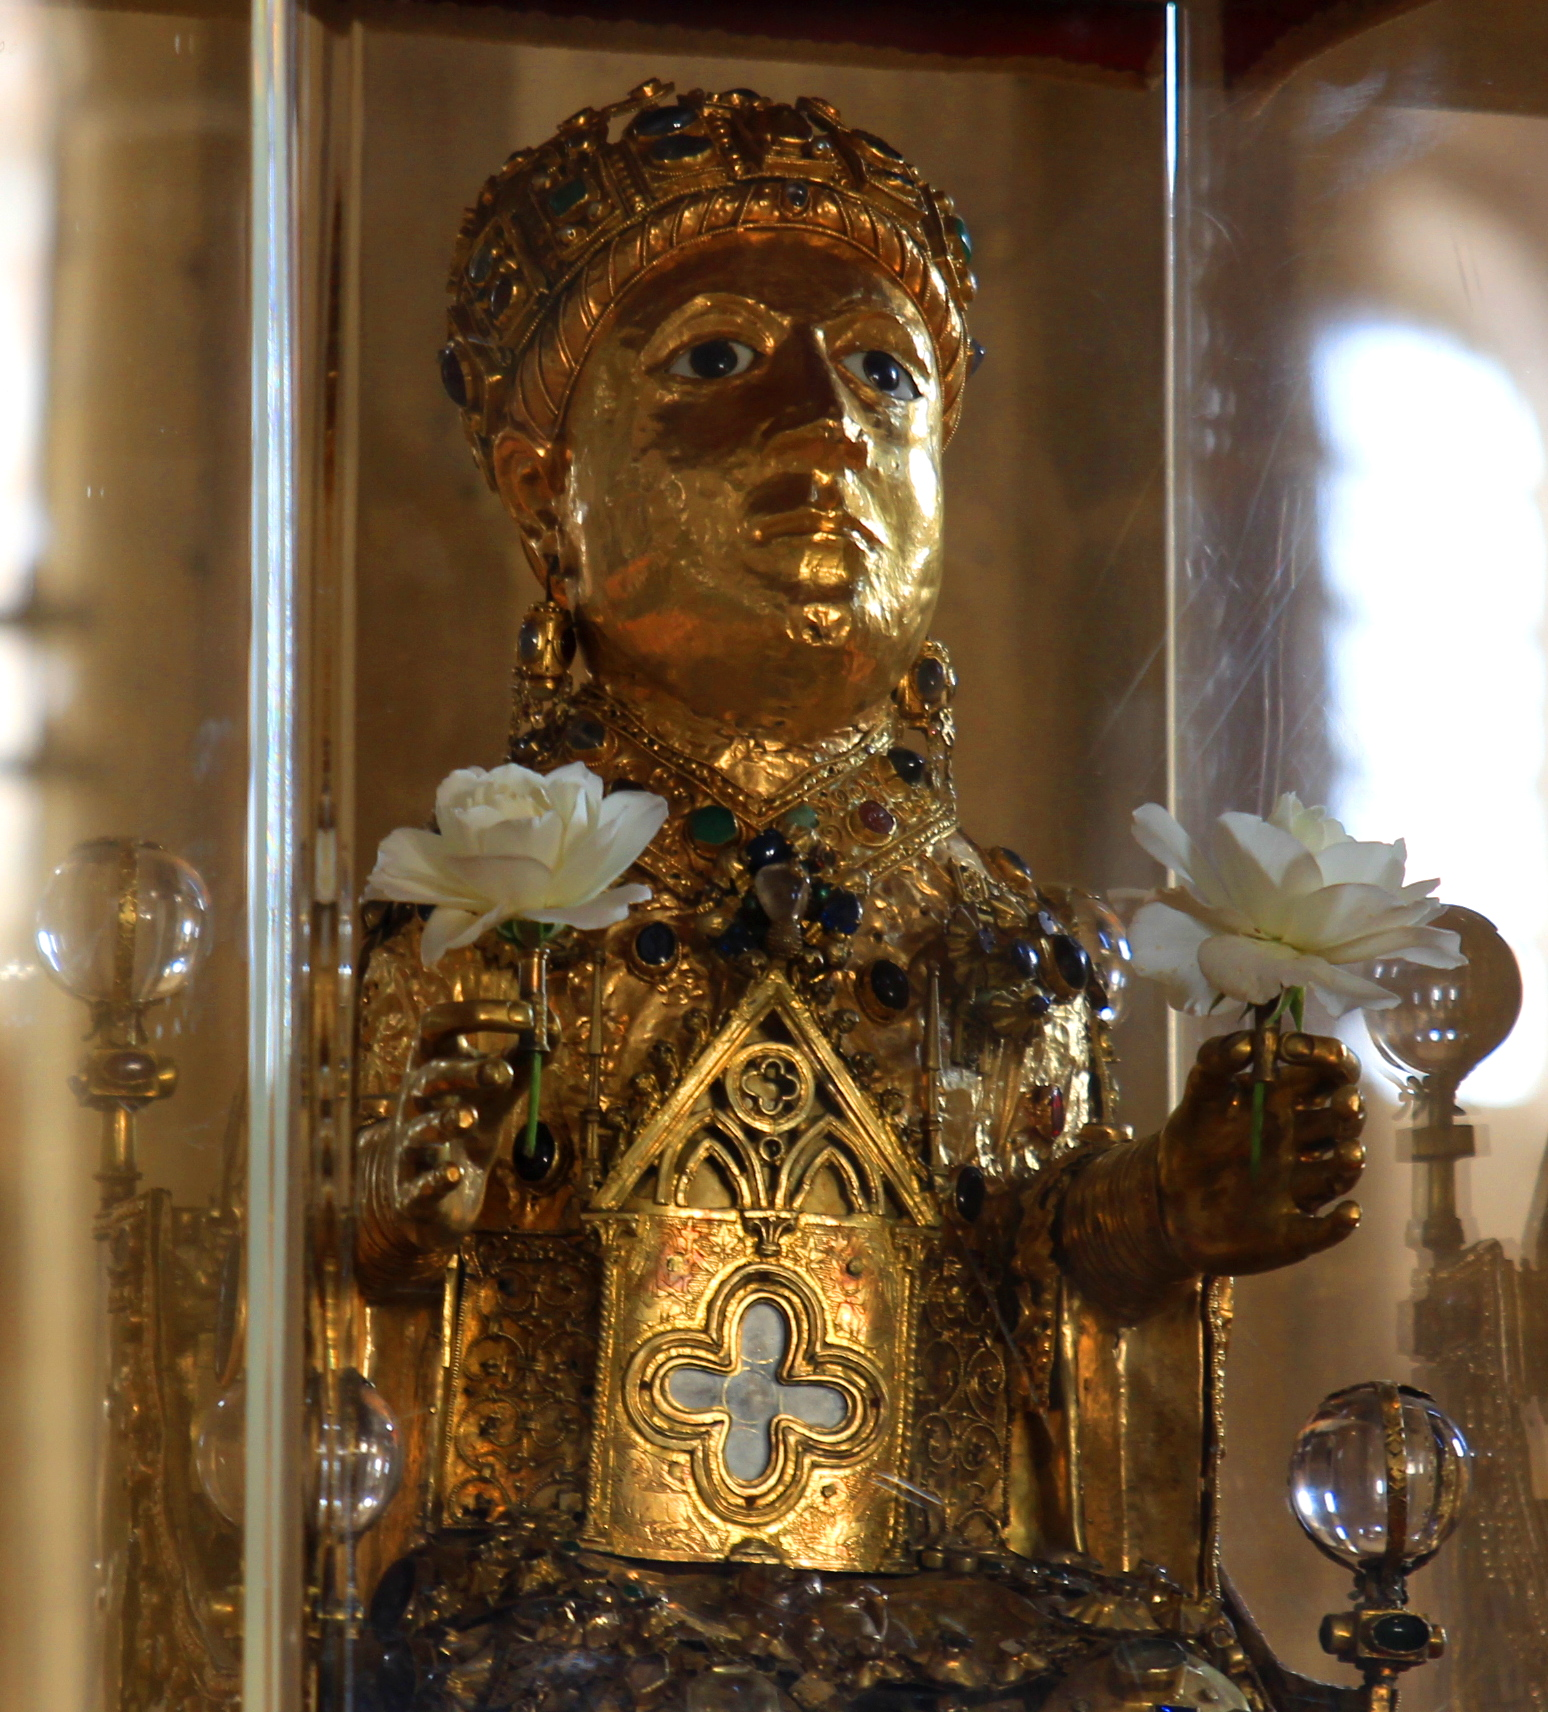 Statue reliquaire de Sainte-Foy de Conques ©Wikimedia